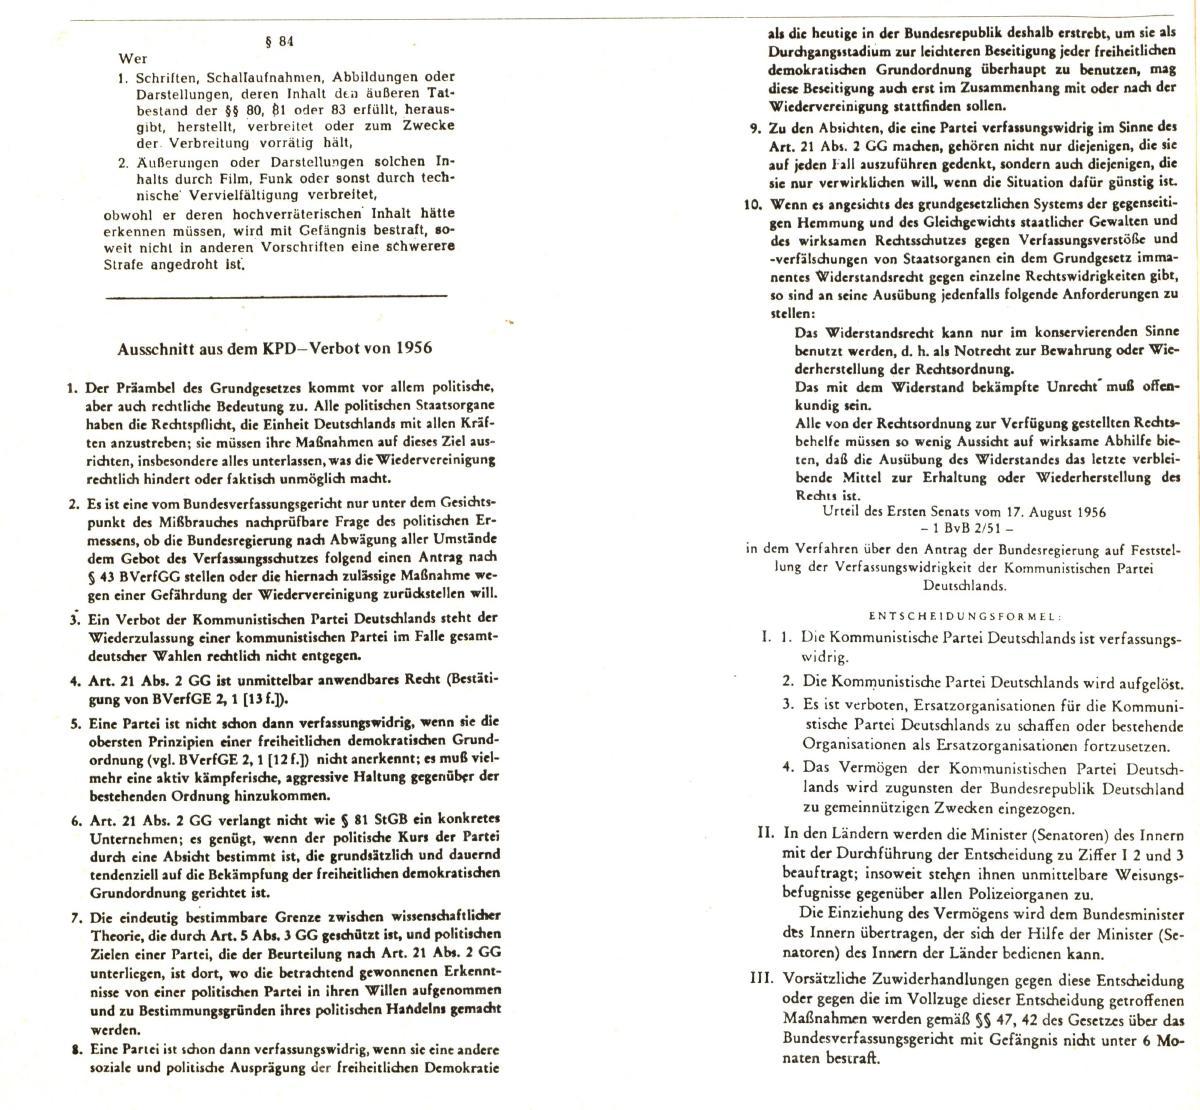 REP_VLB_1976_Die_Zensurgesetze_43